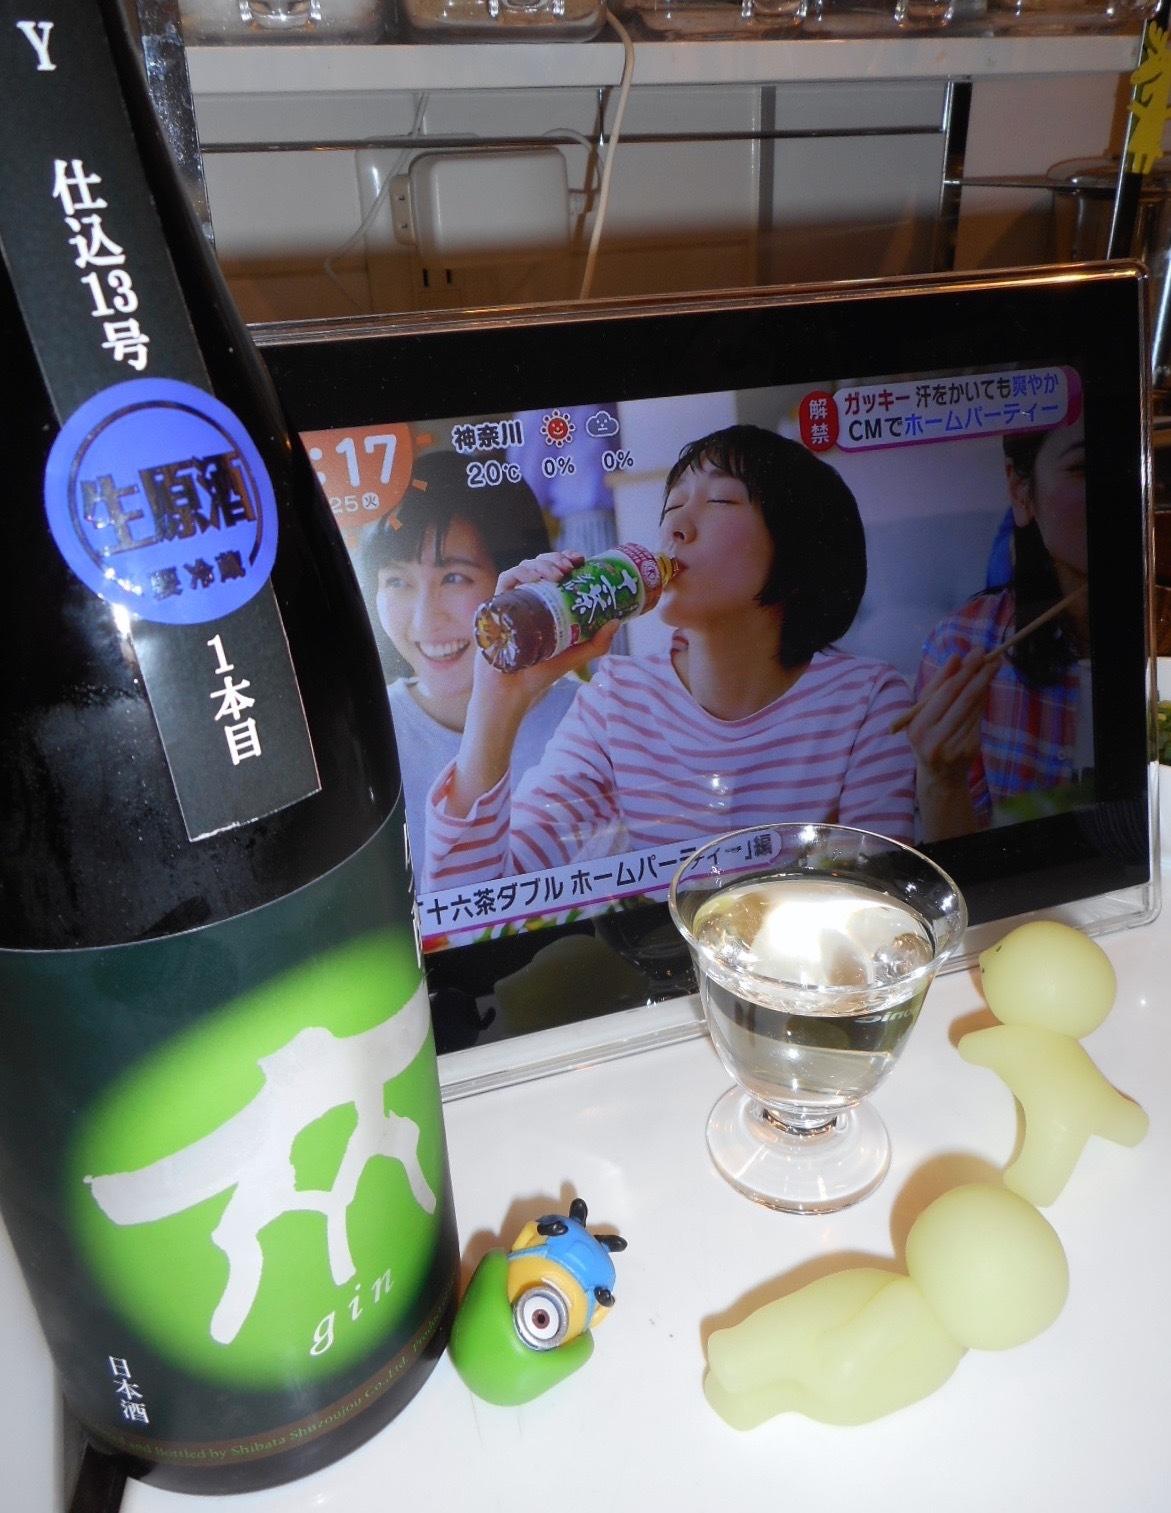 gin_13nama28by10.jpg